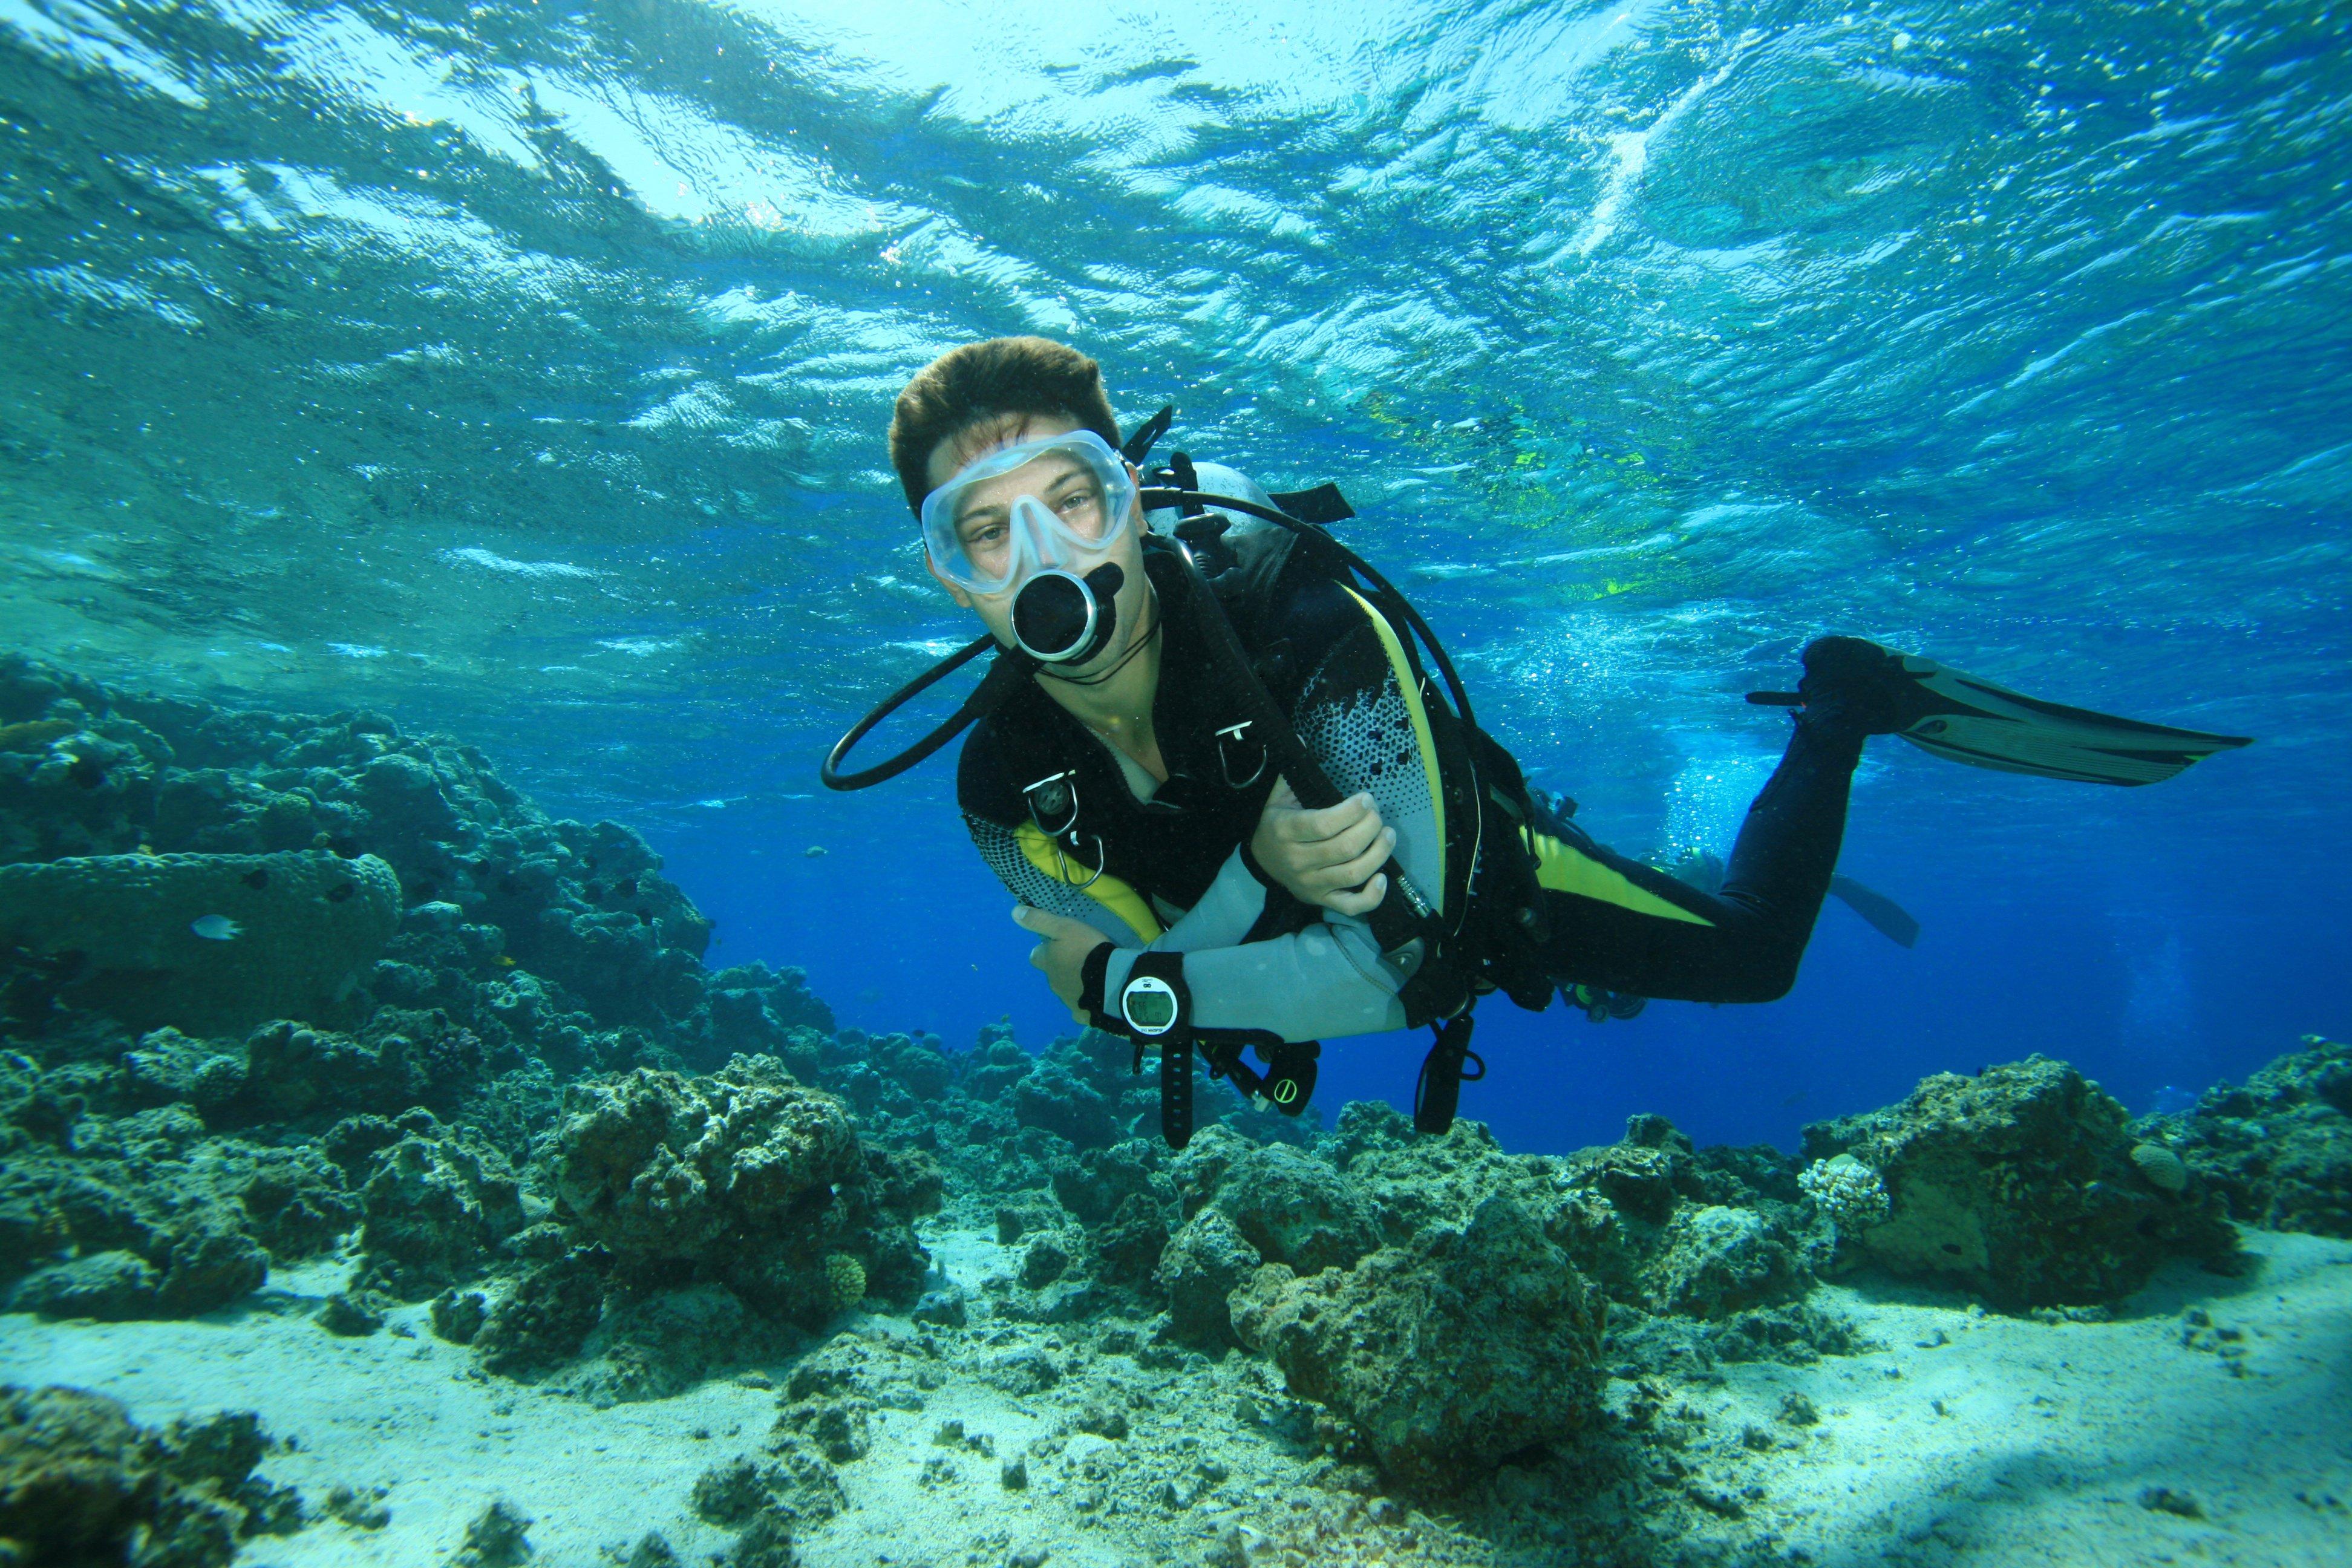 scuba diving wallpaper wallpapers - photo #39